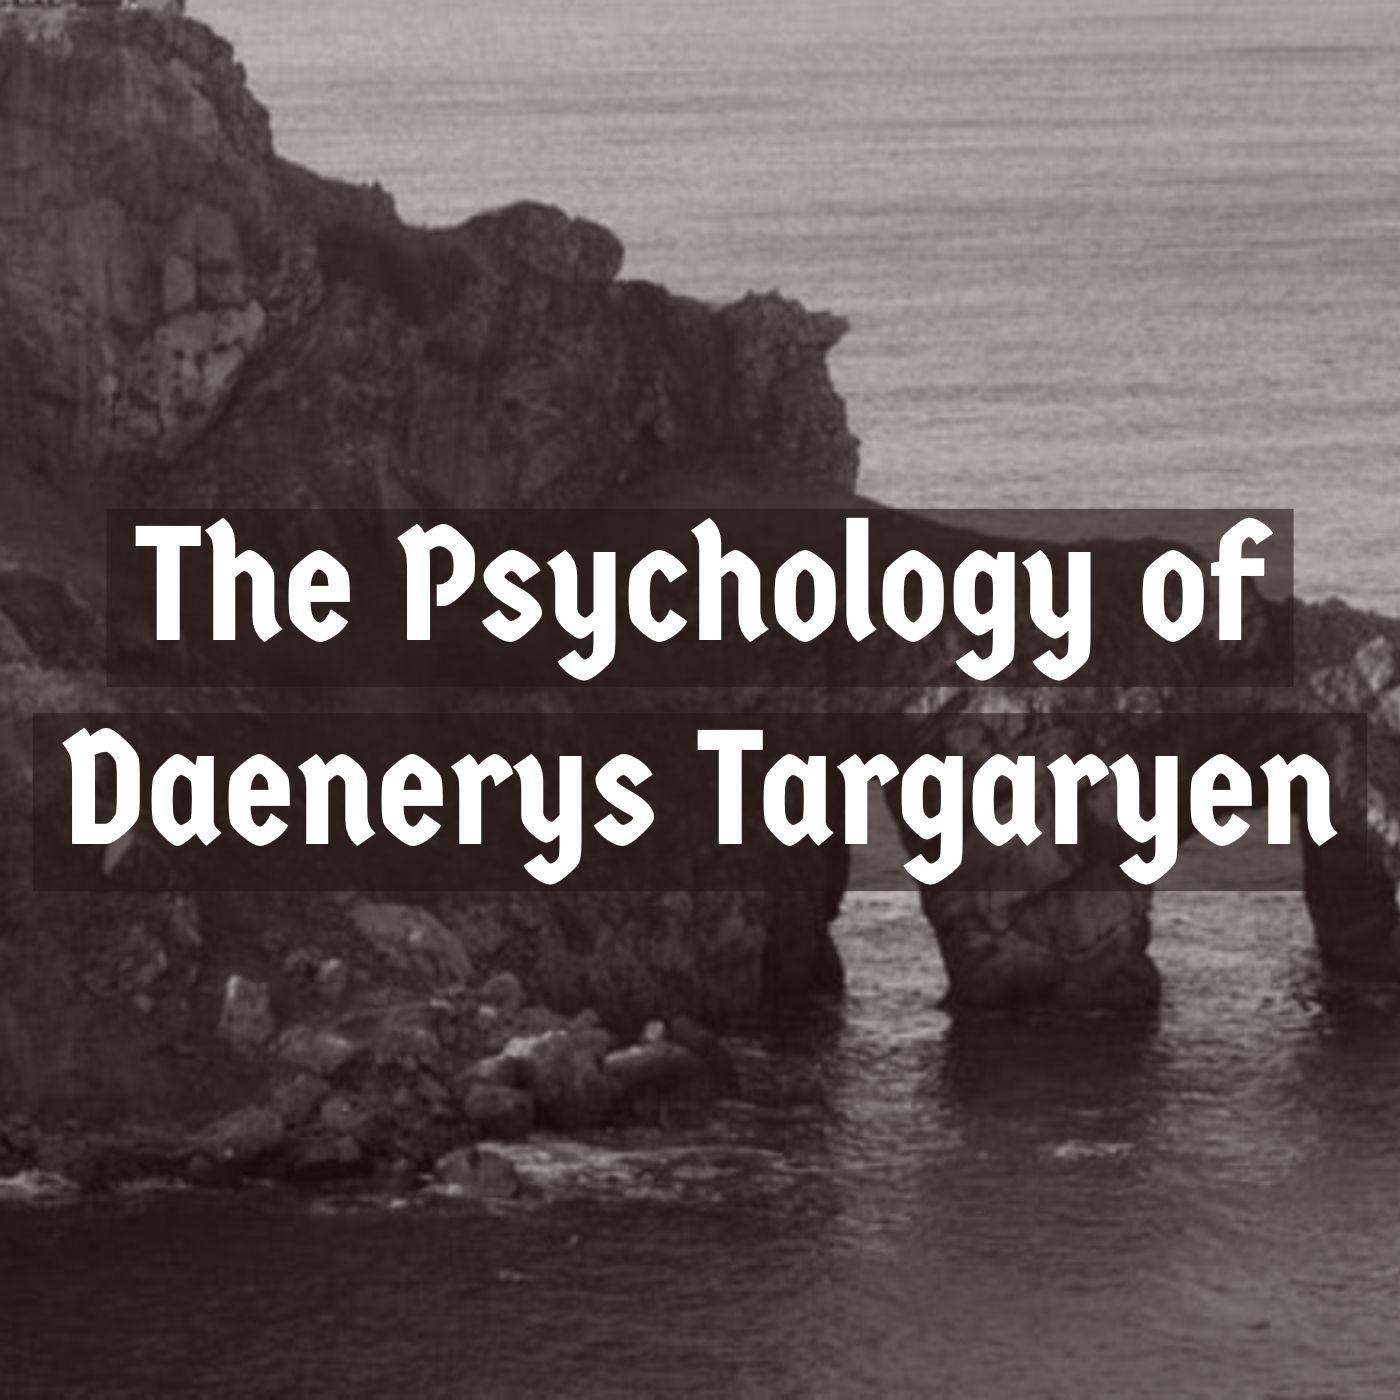 The Psychology of Daenerys Targaryen (2019 Rerun)